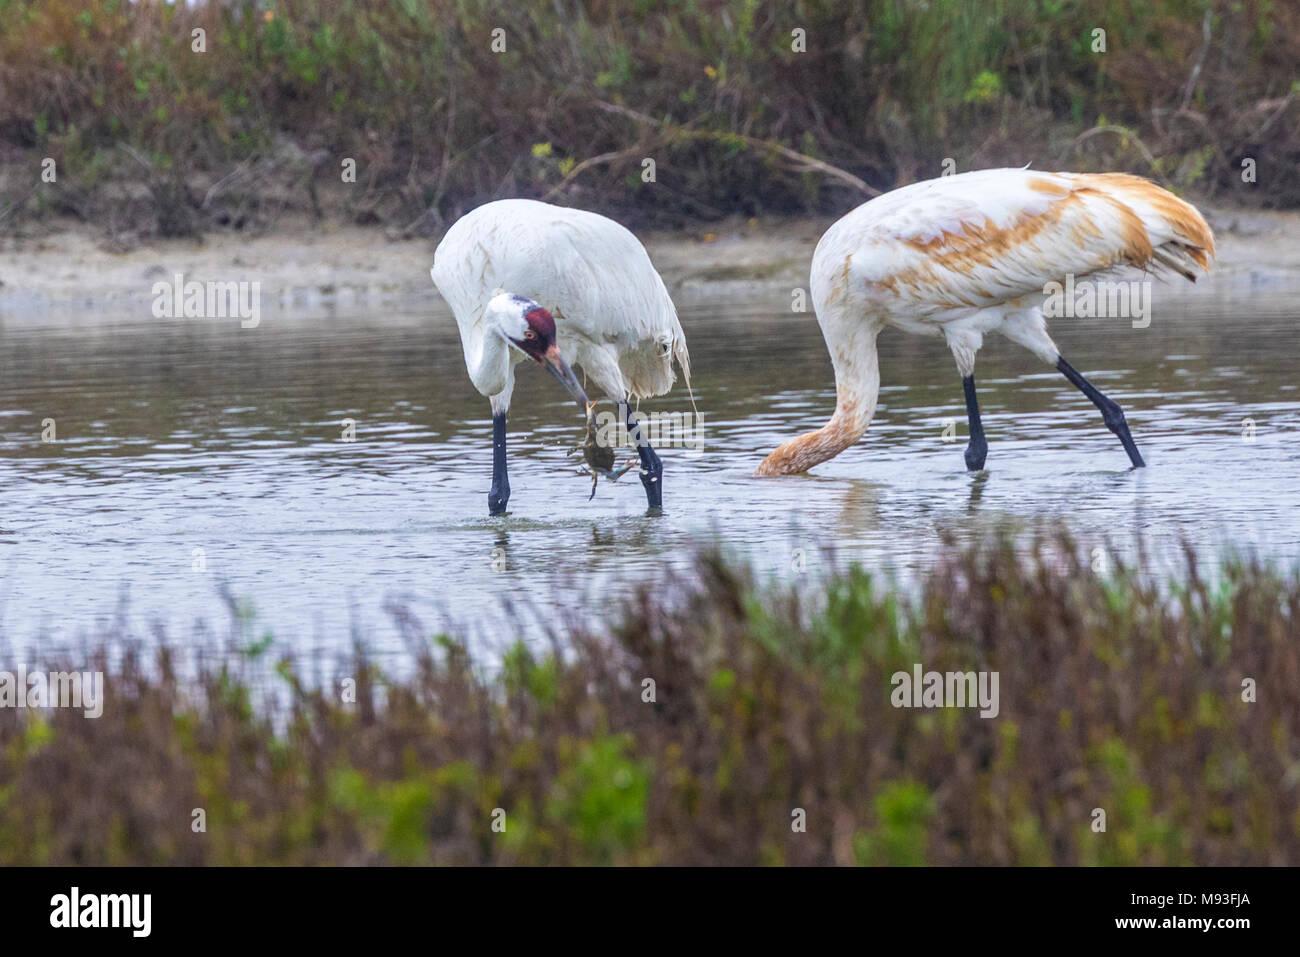 Whooping Cranes in Aransas National Wildlife Refuge - Stock Image